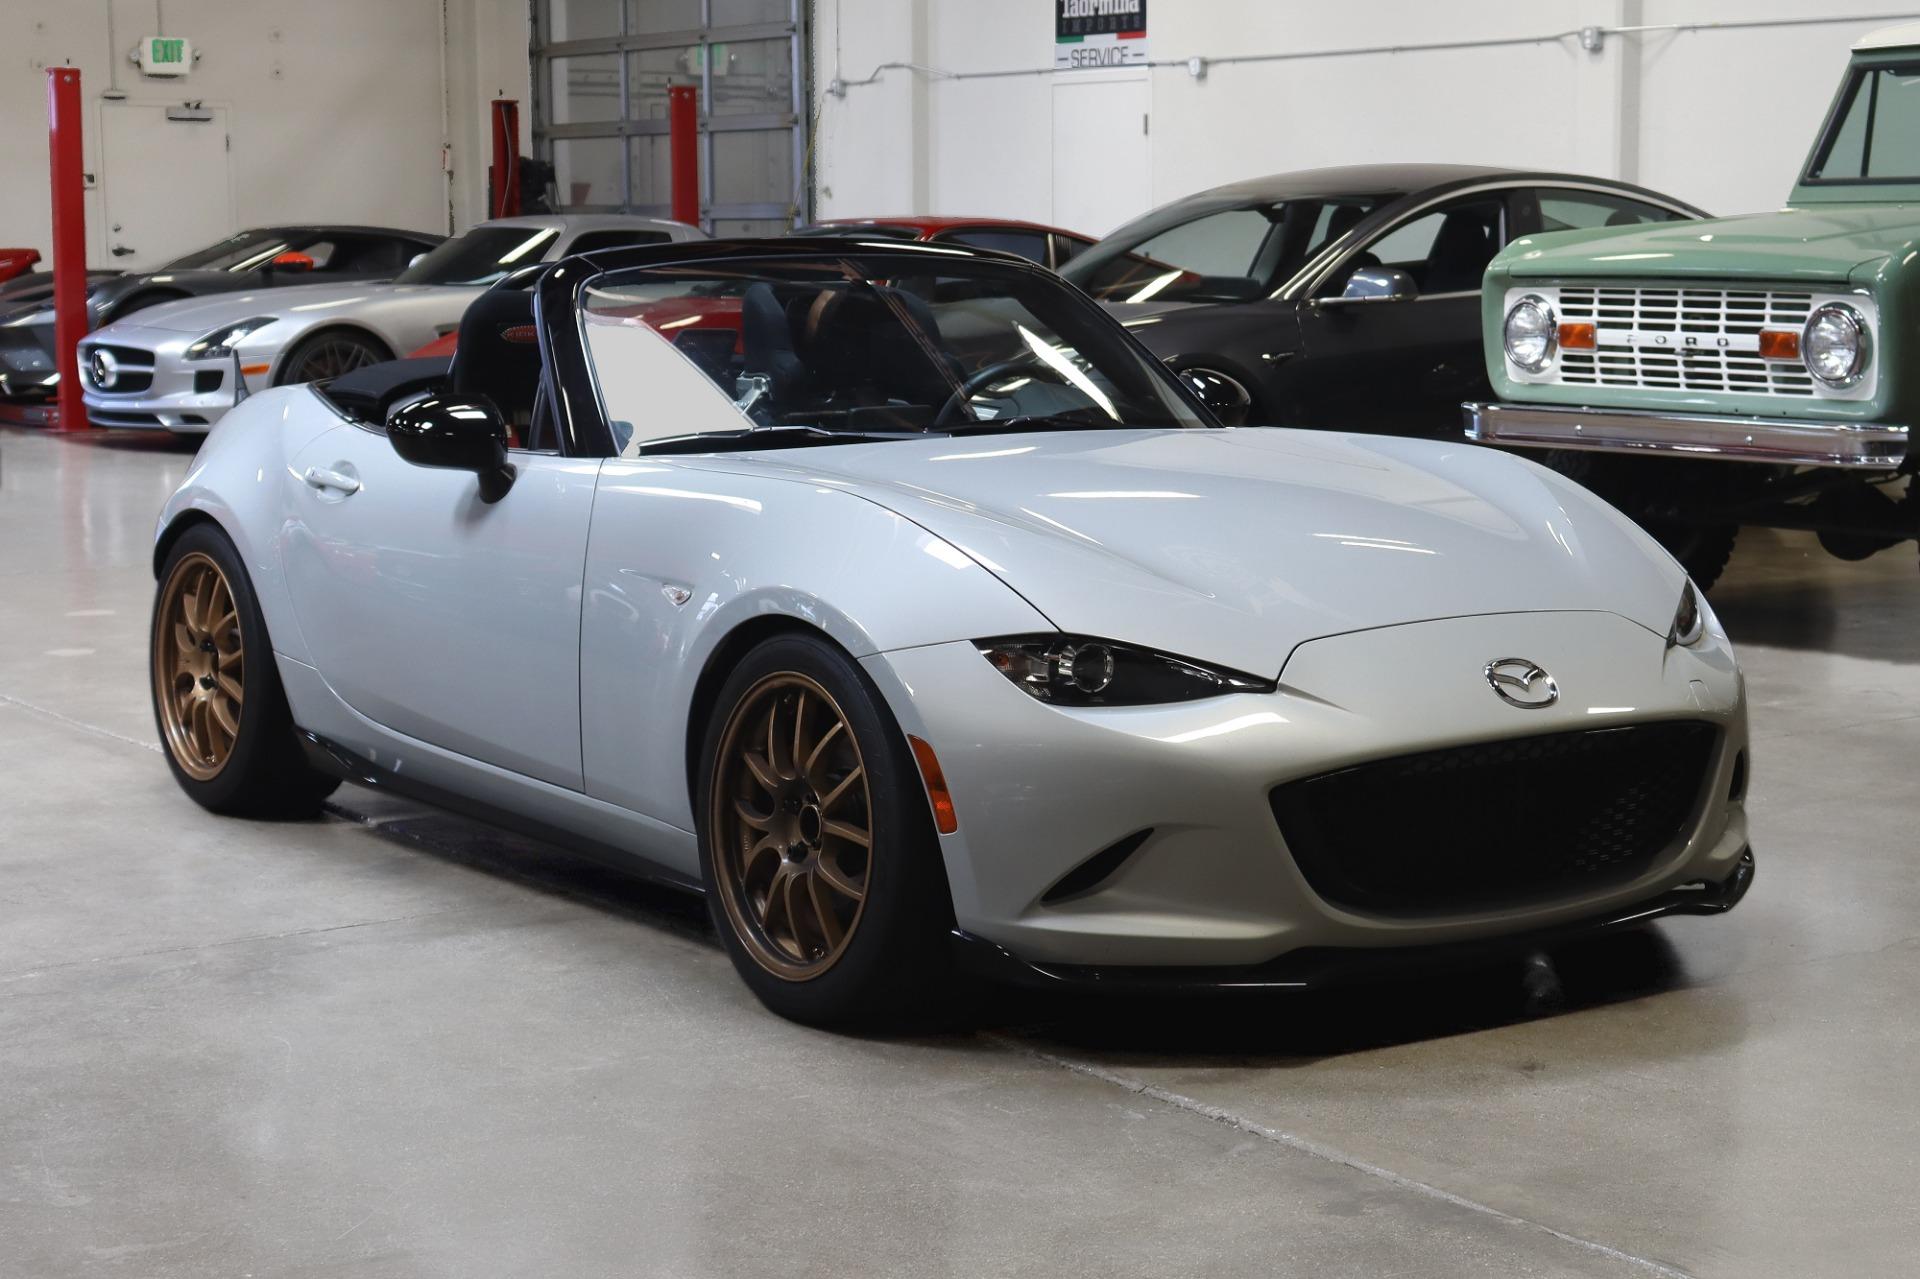 Used 2019 Mazda MX-5 Miata Club for sale $30,995 at San Francisco Sports Cars in San Carlos CA 94070 1